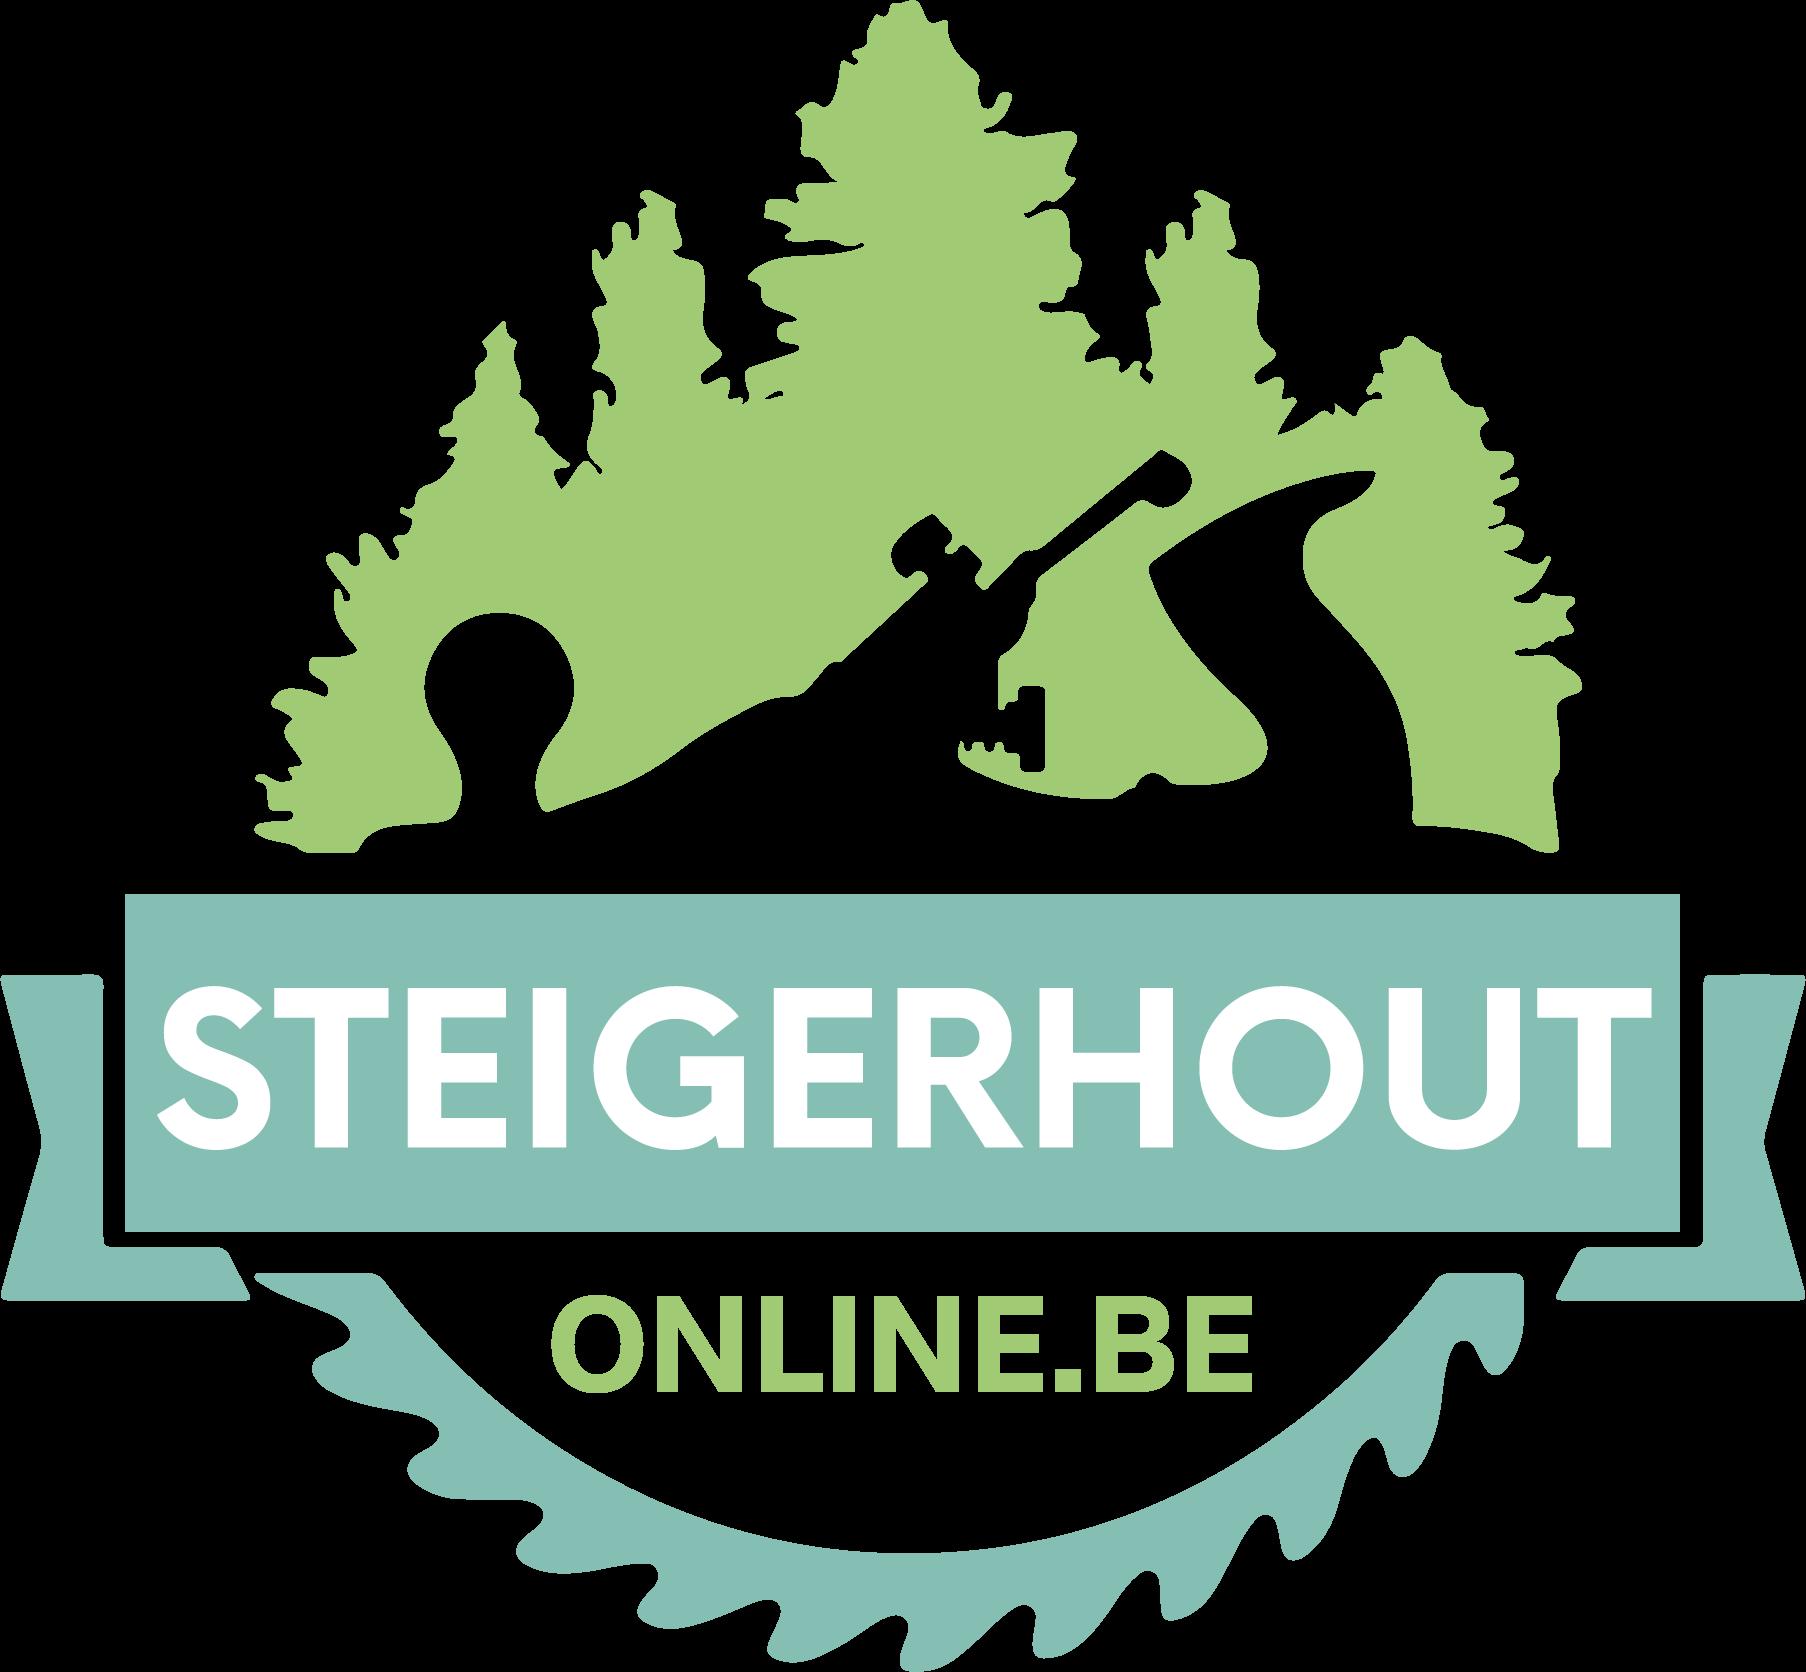 Steigerhoutonline.be | Maak van je huis je thuis